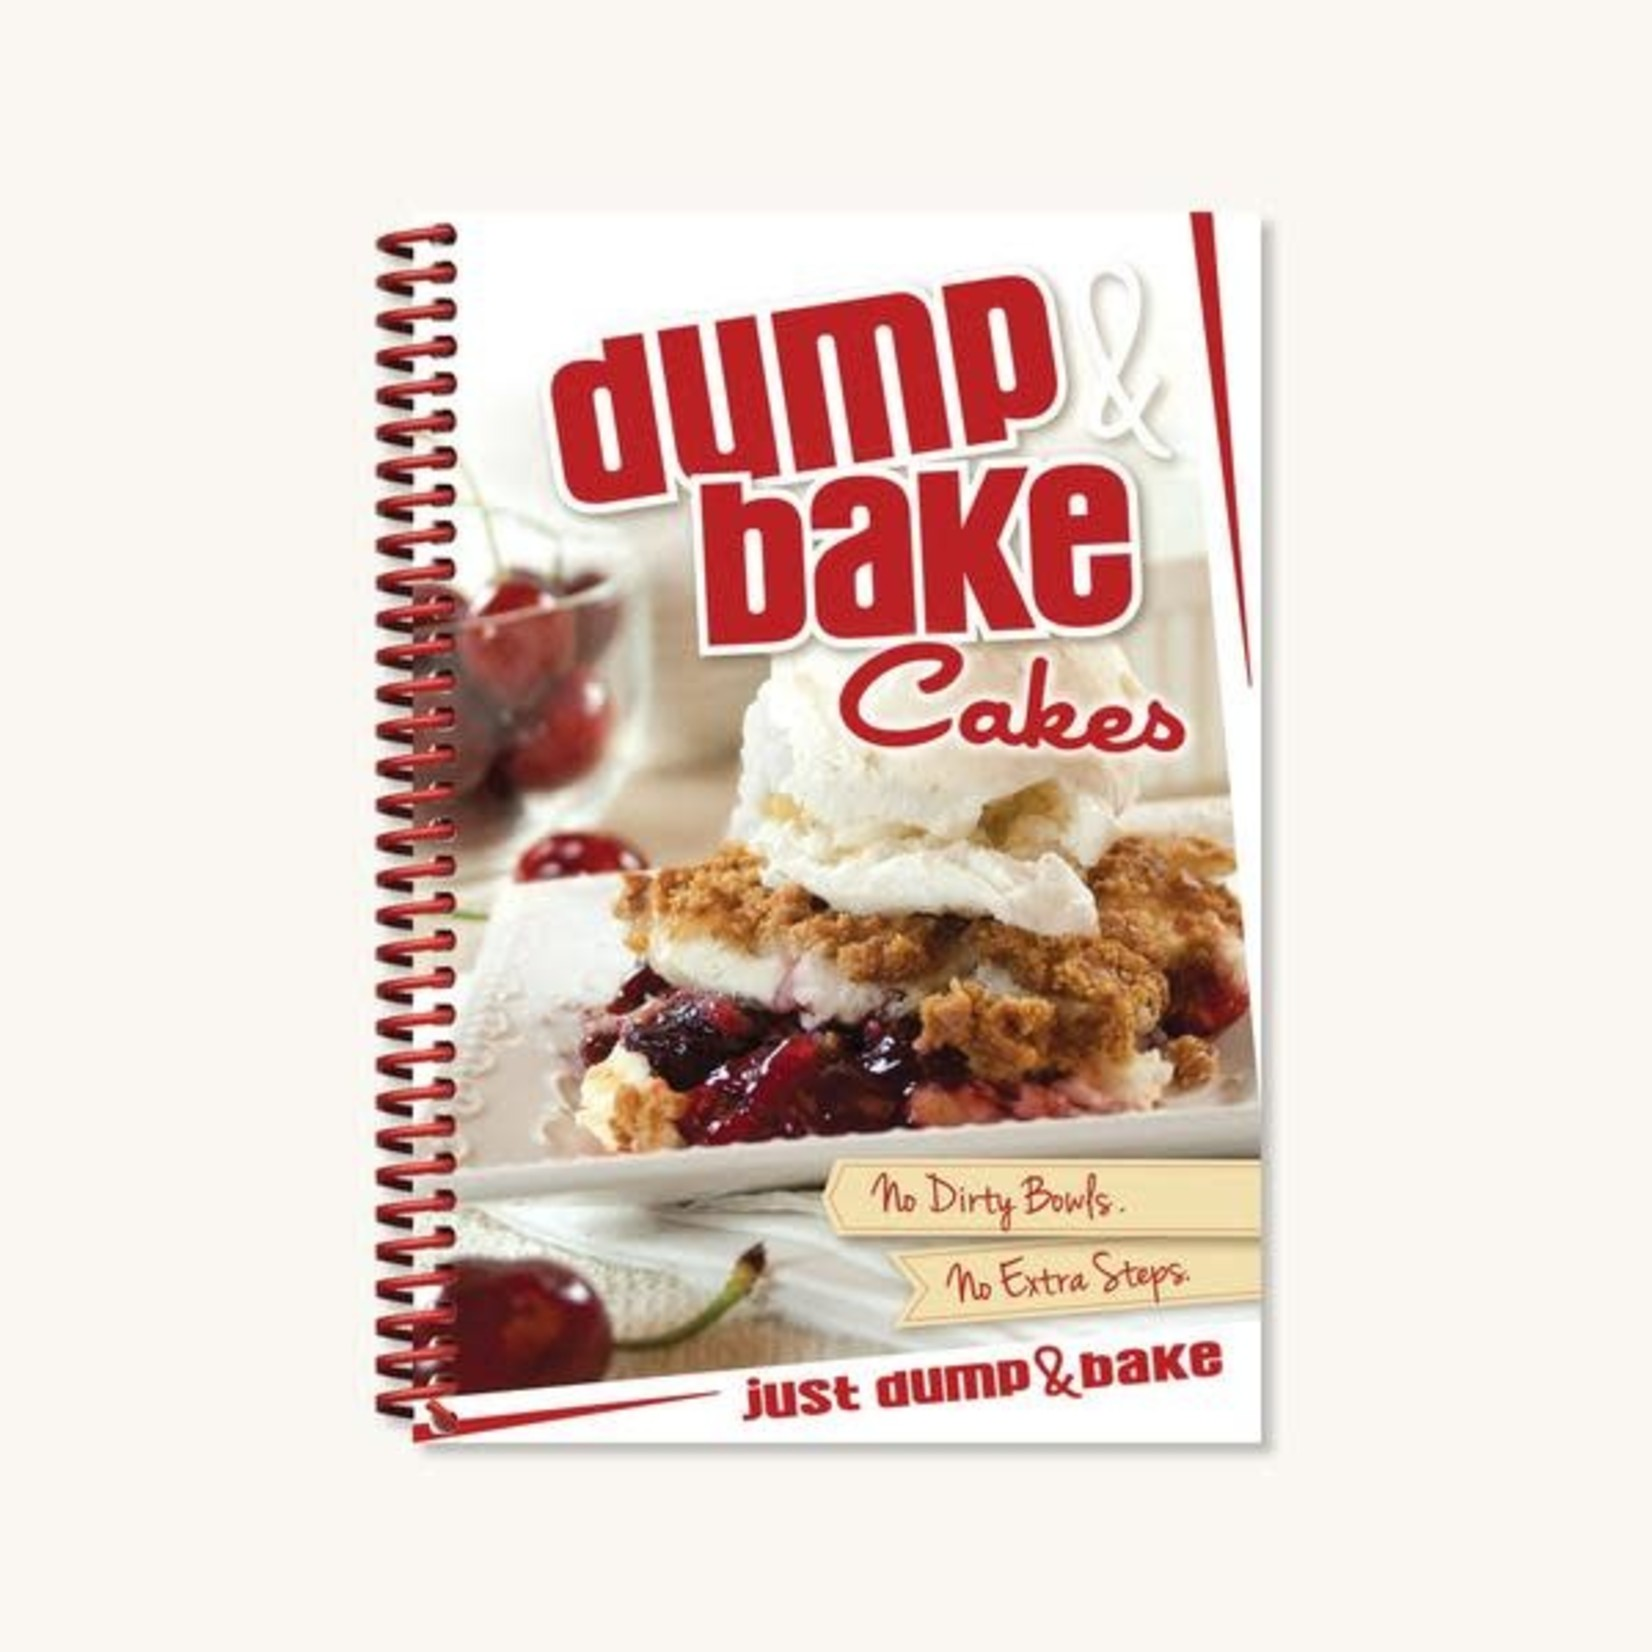 DUMP BAKE CAKES COOKBOOK